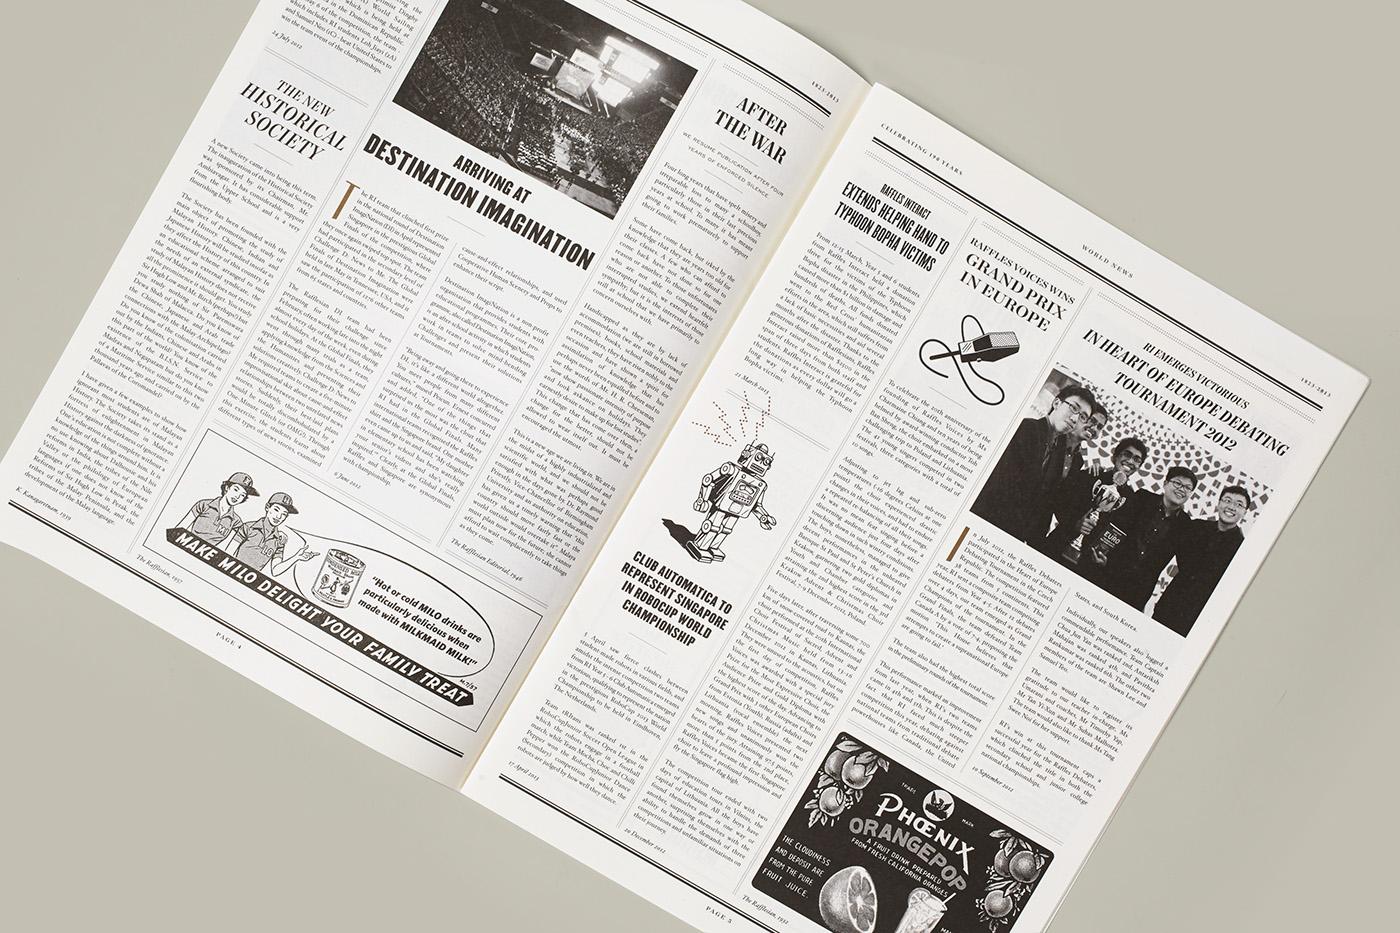 print institution campaign content direction art vintage